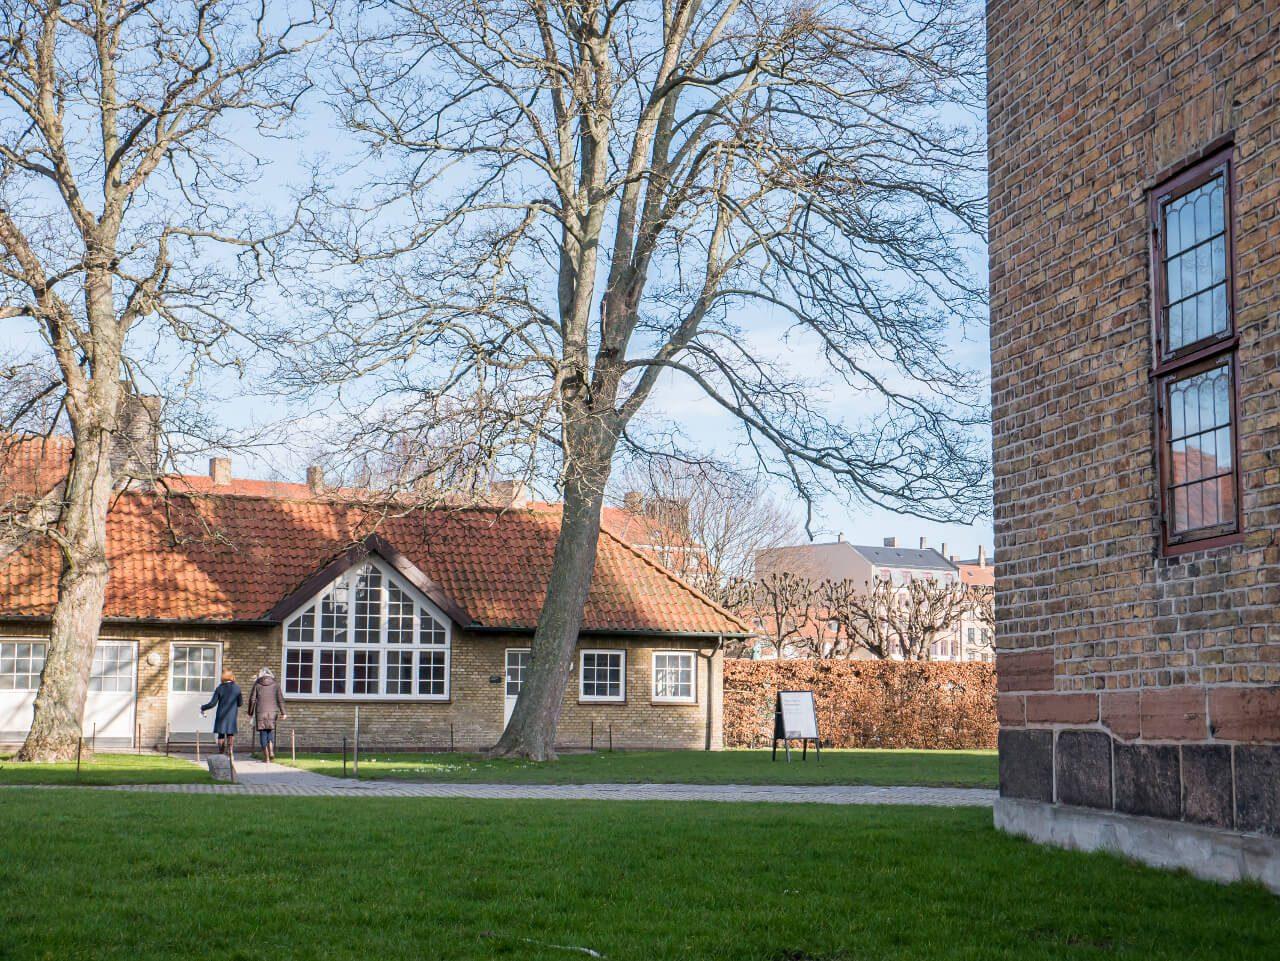 Zabudowania pałacu Rosenborg